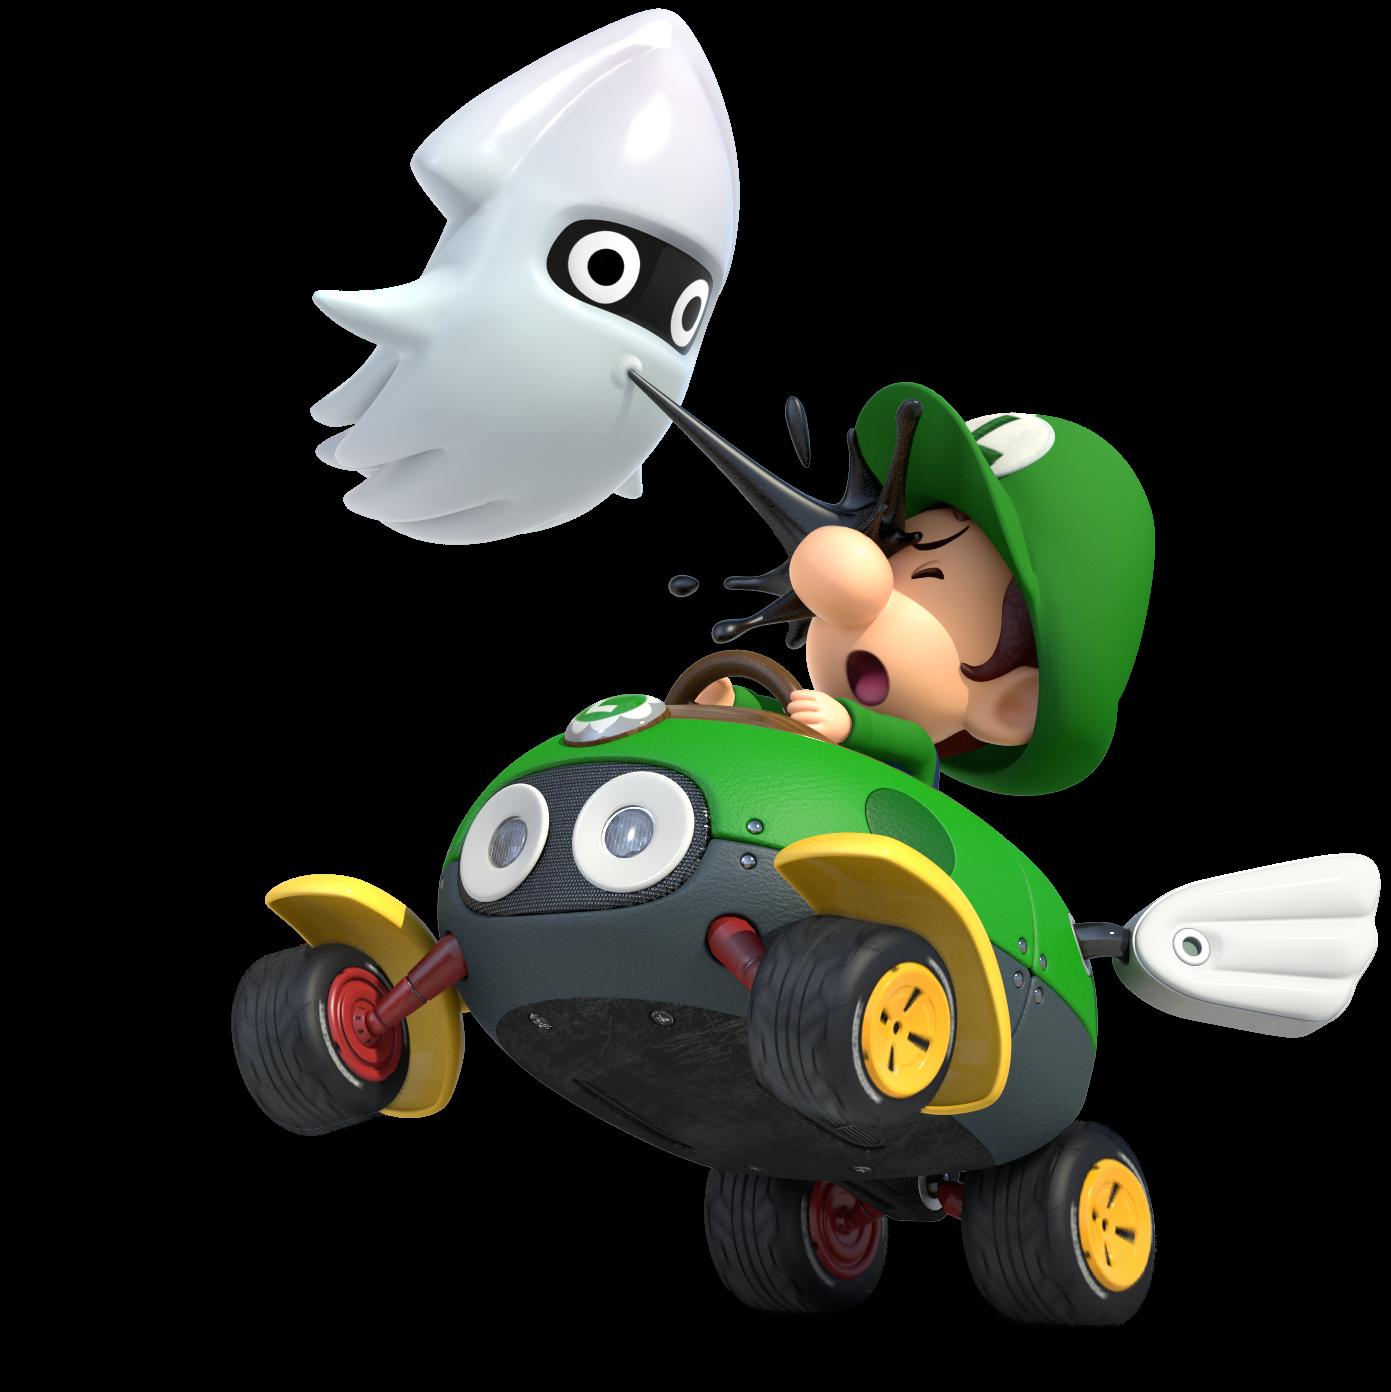 Mario Kart Double Dash - Baby Mario & Baby Luigi - Star ...  |Baby Mario And Baby Luigi Mario Kart Double Dash